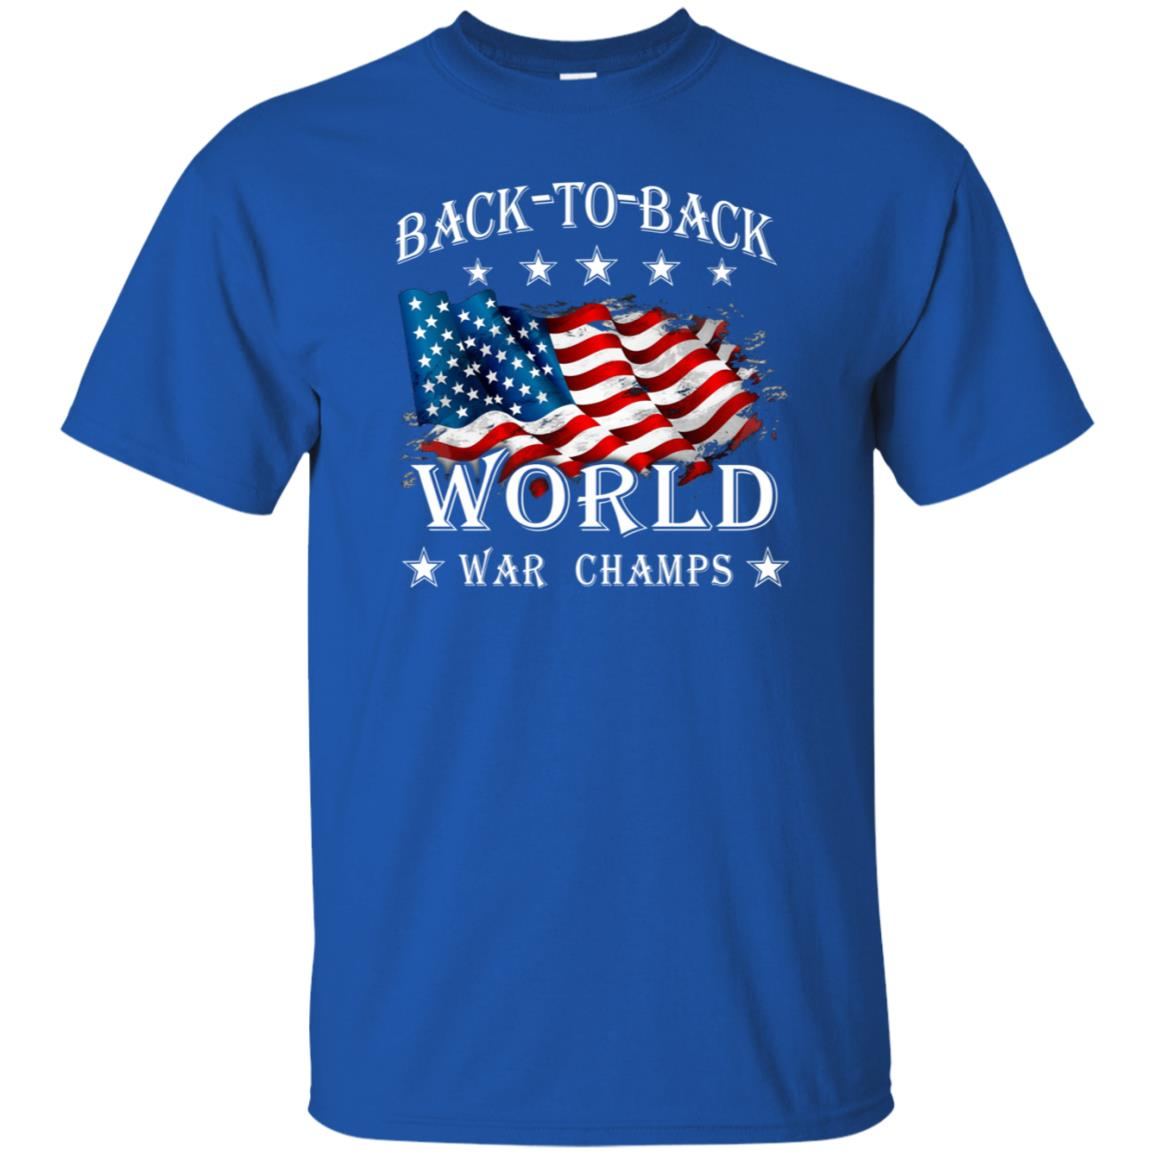 e5970b6a3 America Back To Back World War Champs Shirt - 10% Off - FavorMerch